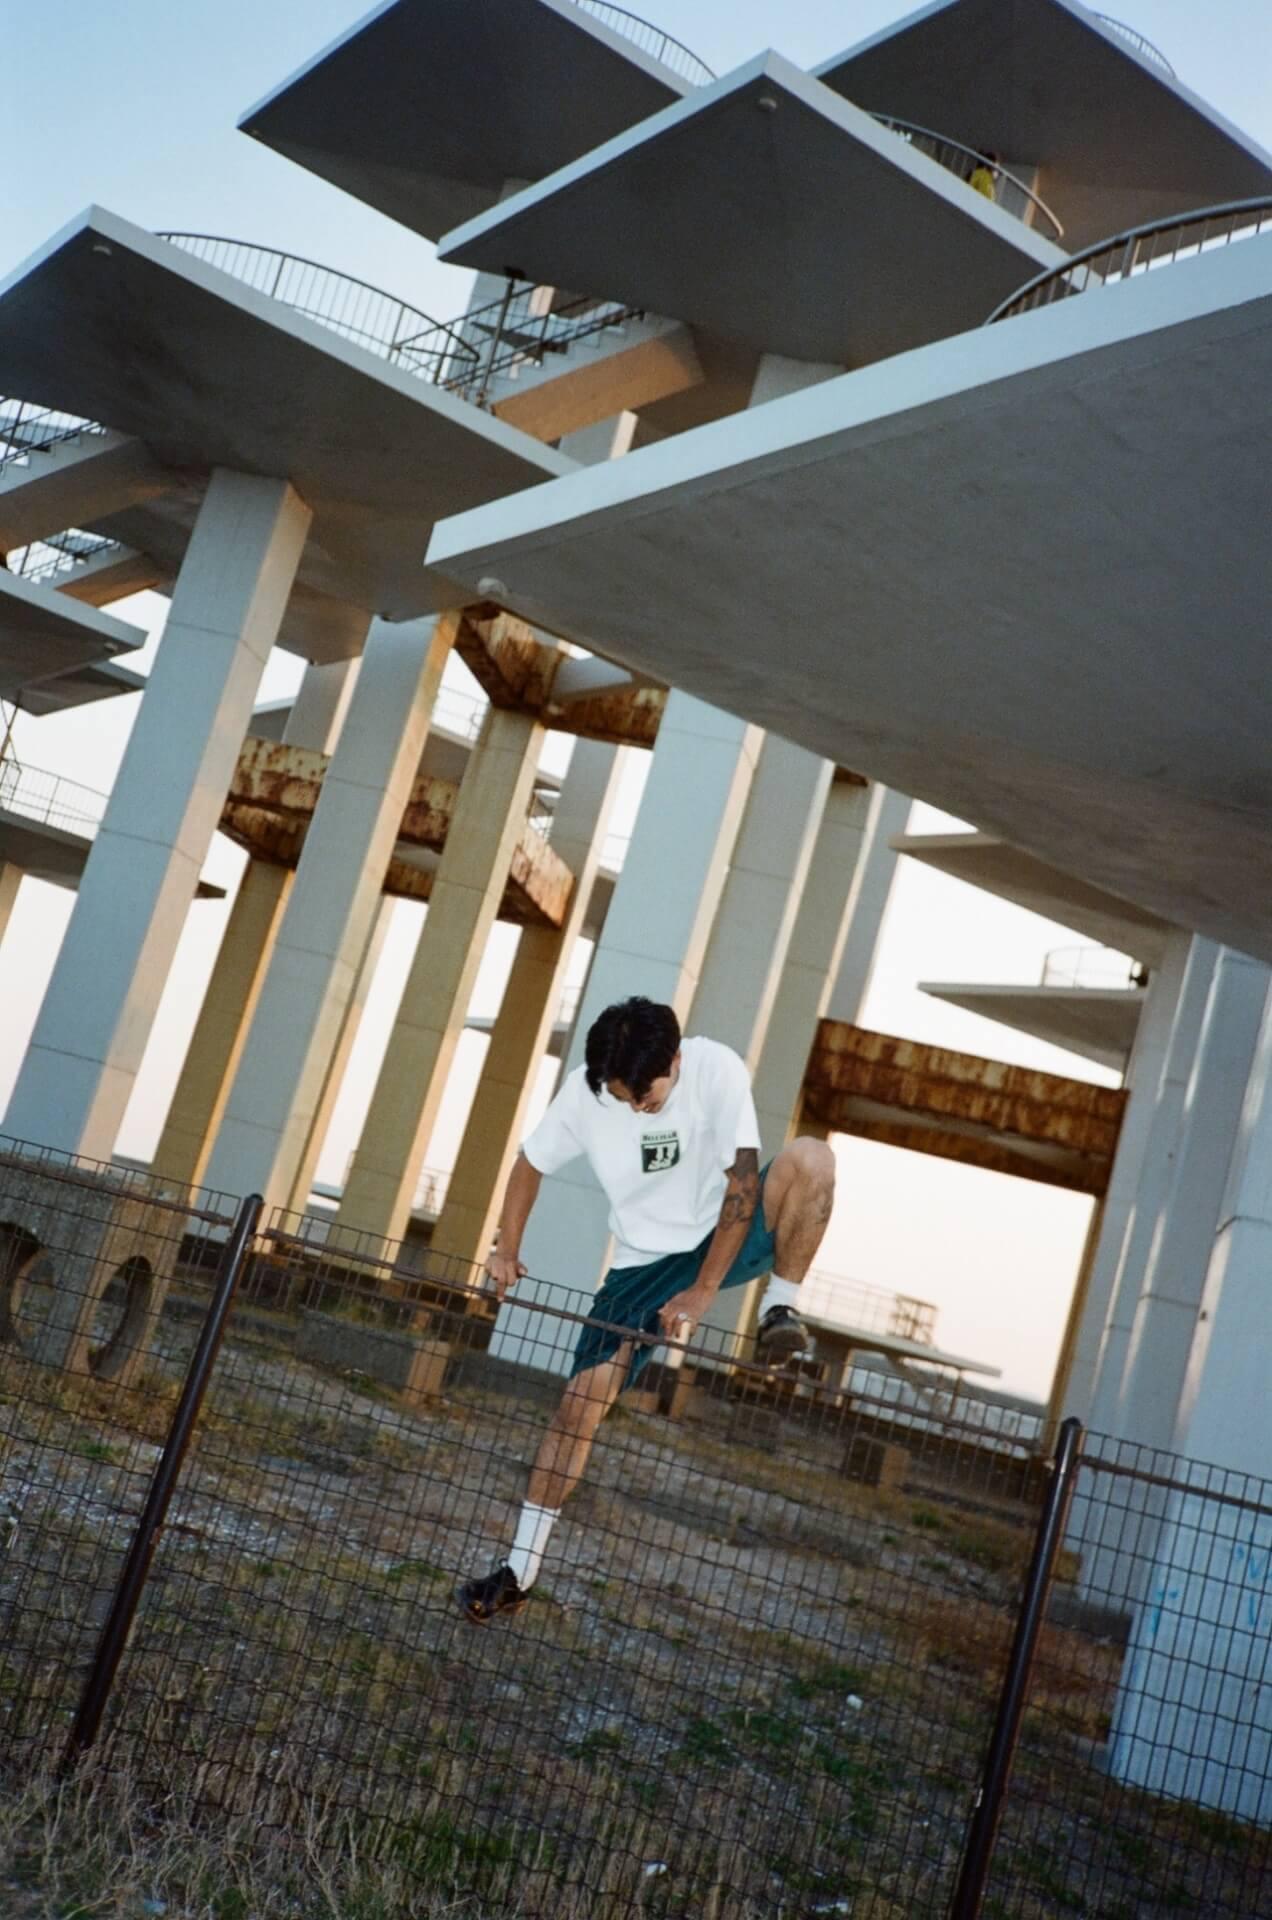 MEN YARD FIGHTなどでポップアップを行う「KIRIME」、次の展示は東急プラザ銀座にて life-fashion210424-kirime-26